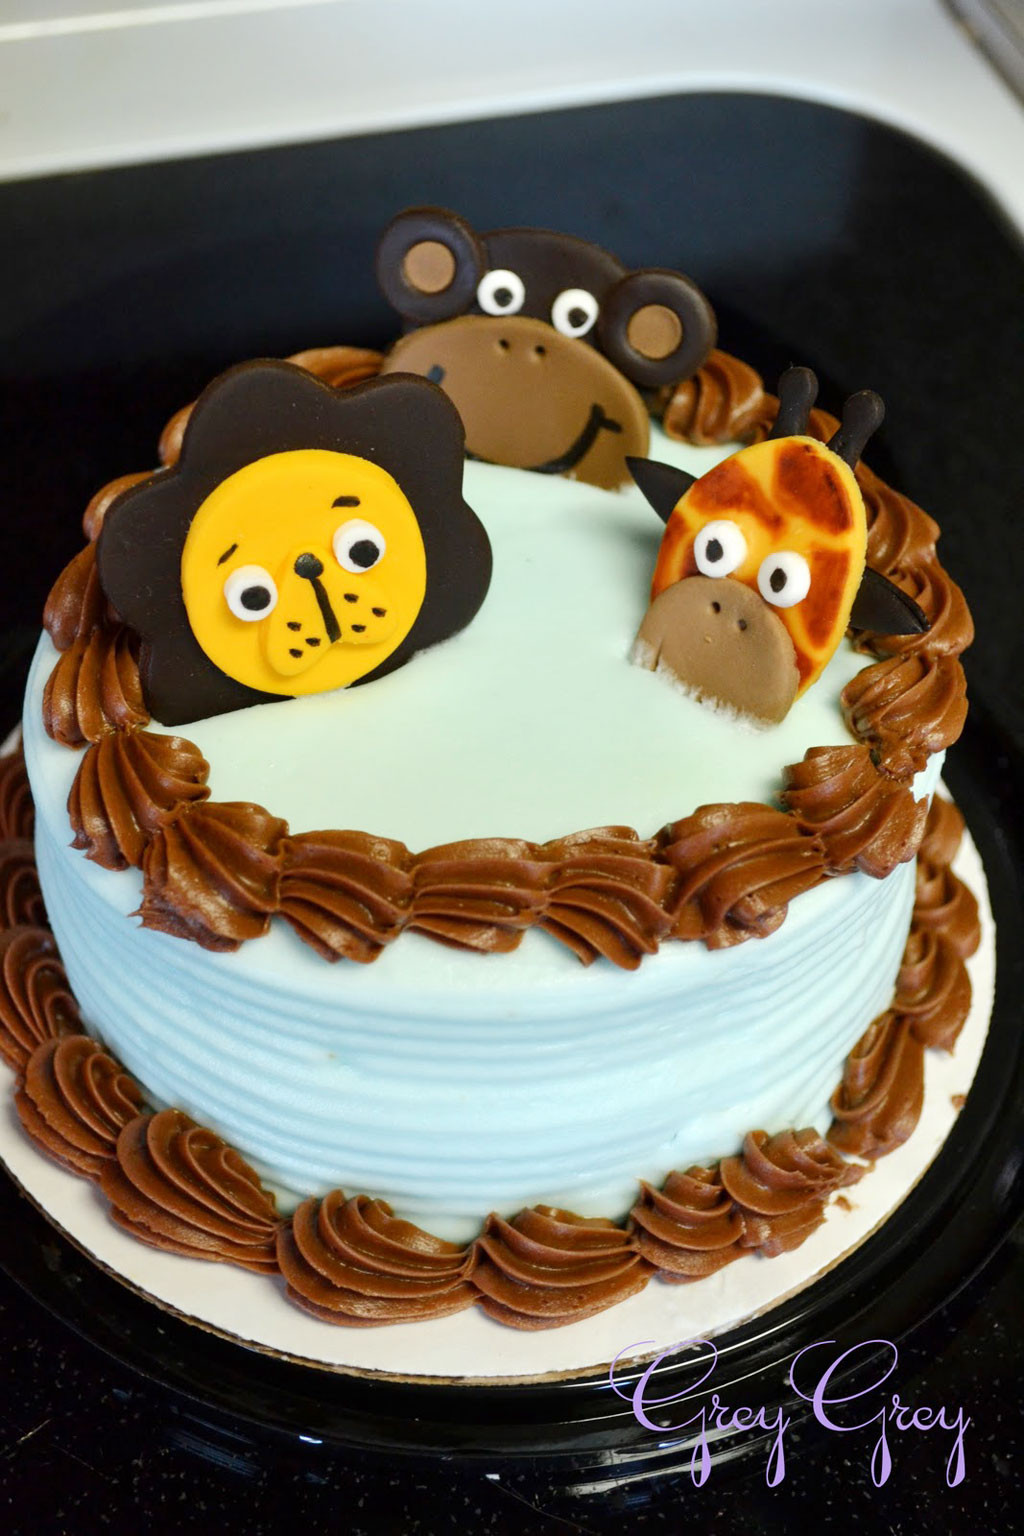 Schnucks Wedding Cakes  Schnucks Birthday Cakes Designs Birthday Cake Cake Ideas